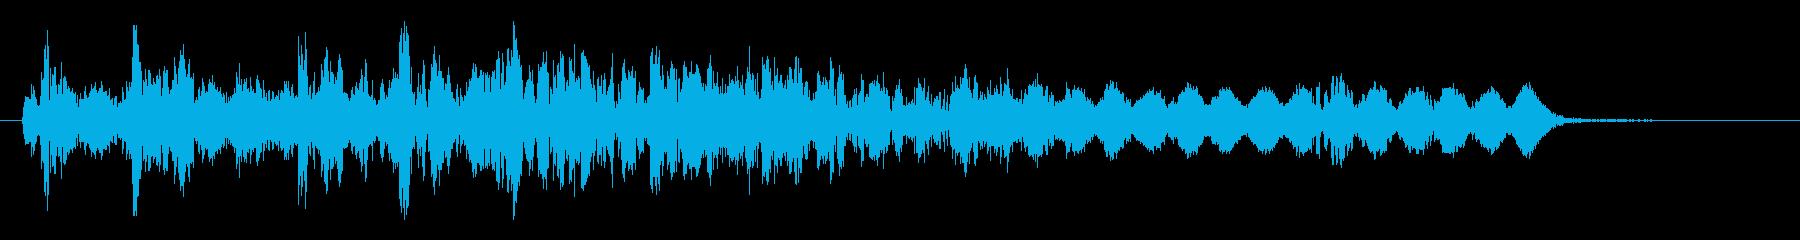 Veldt Door:スライドの再生済みの波形